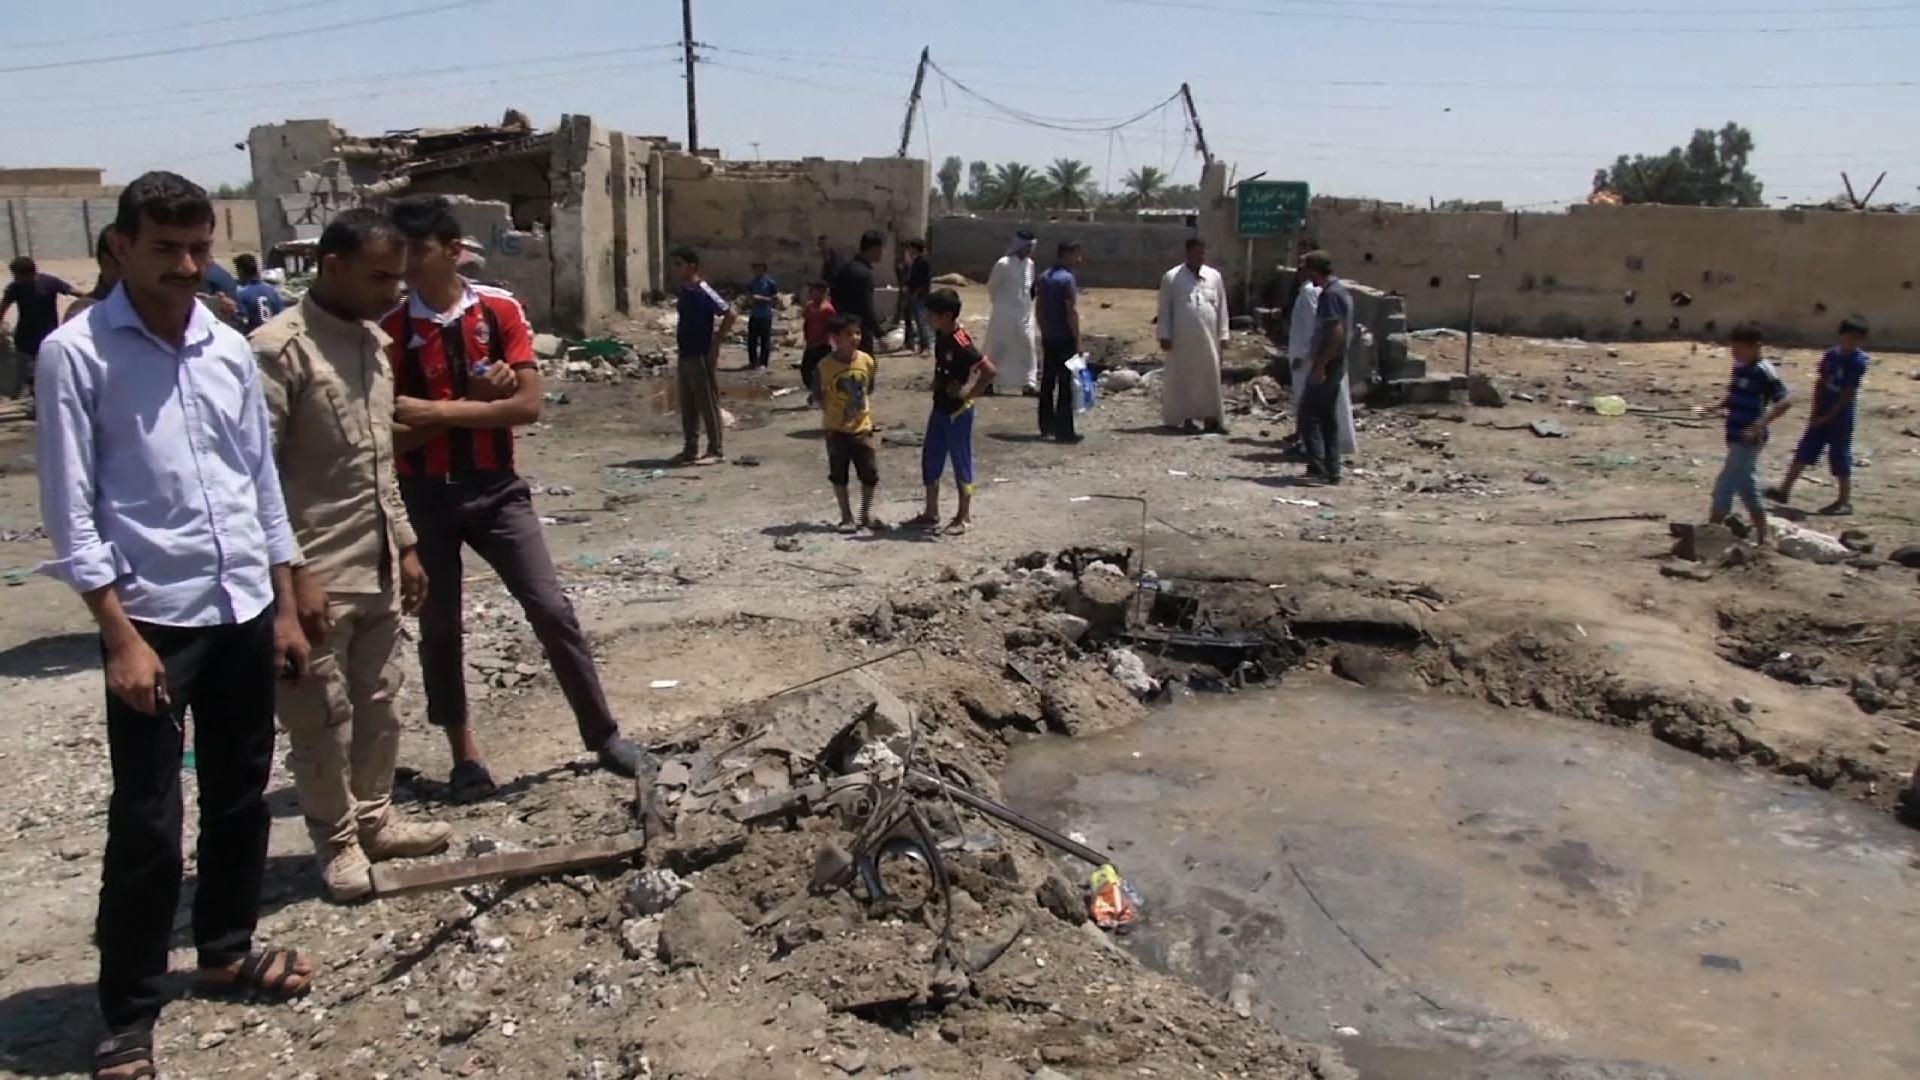 Raw: Deadly Car Bombing in Baghdad